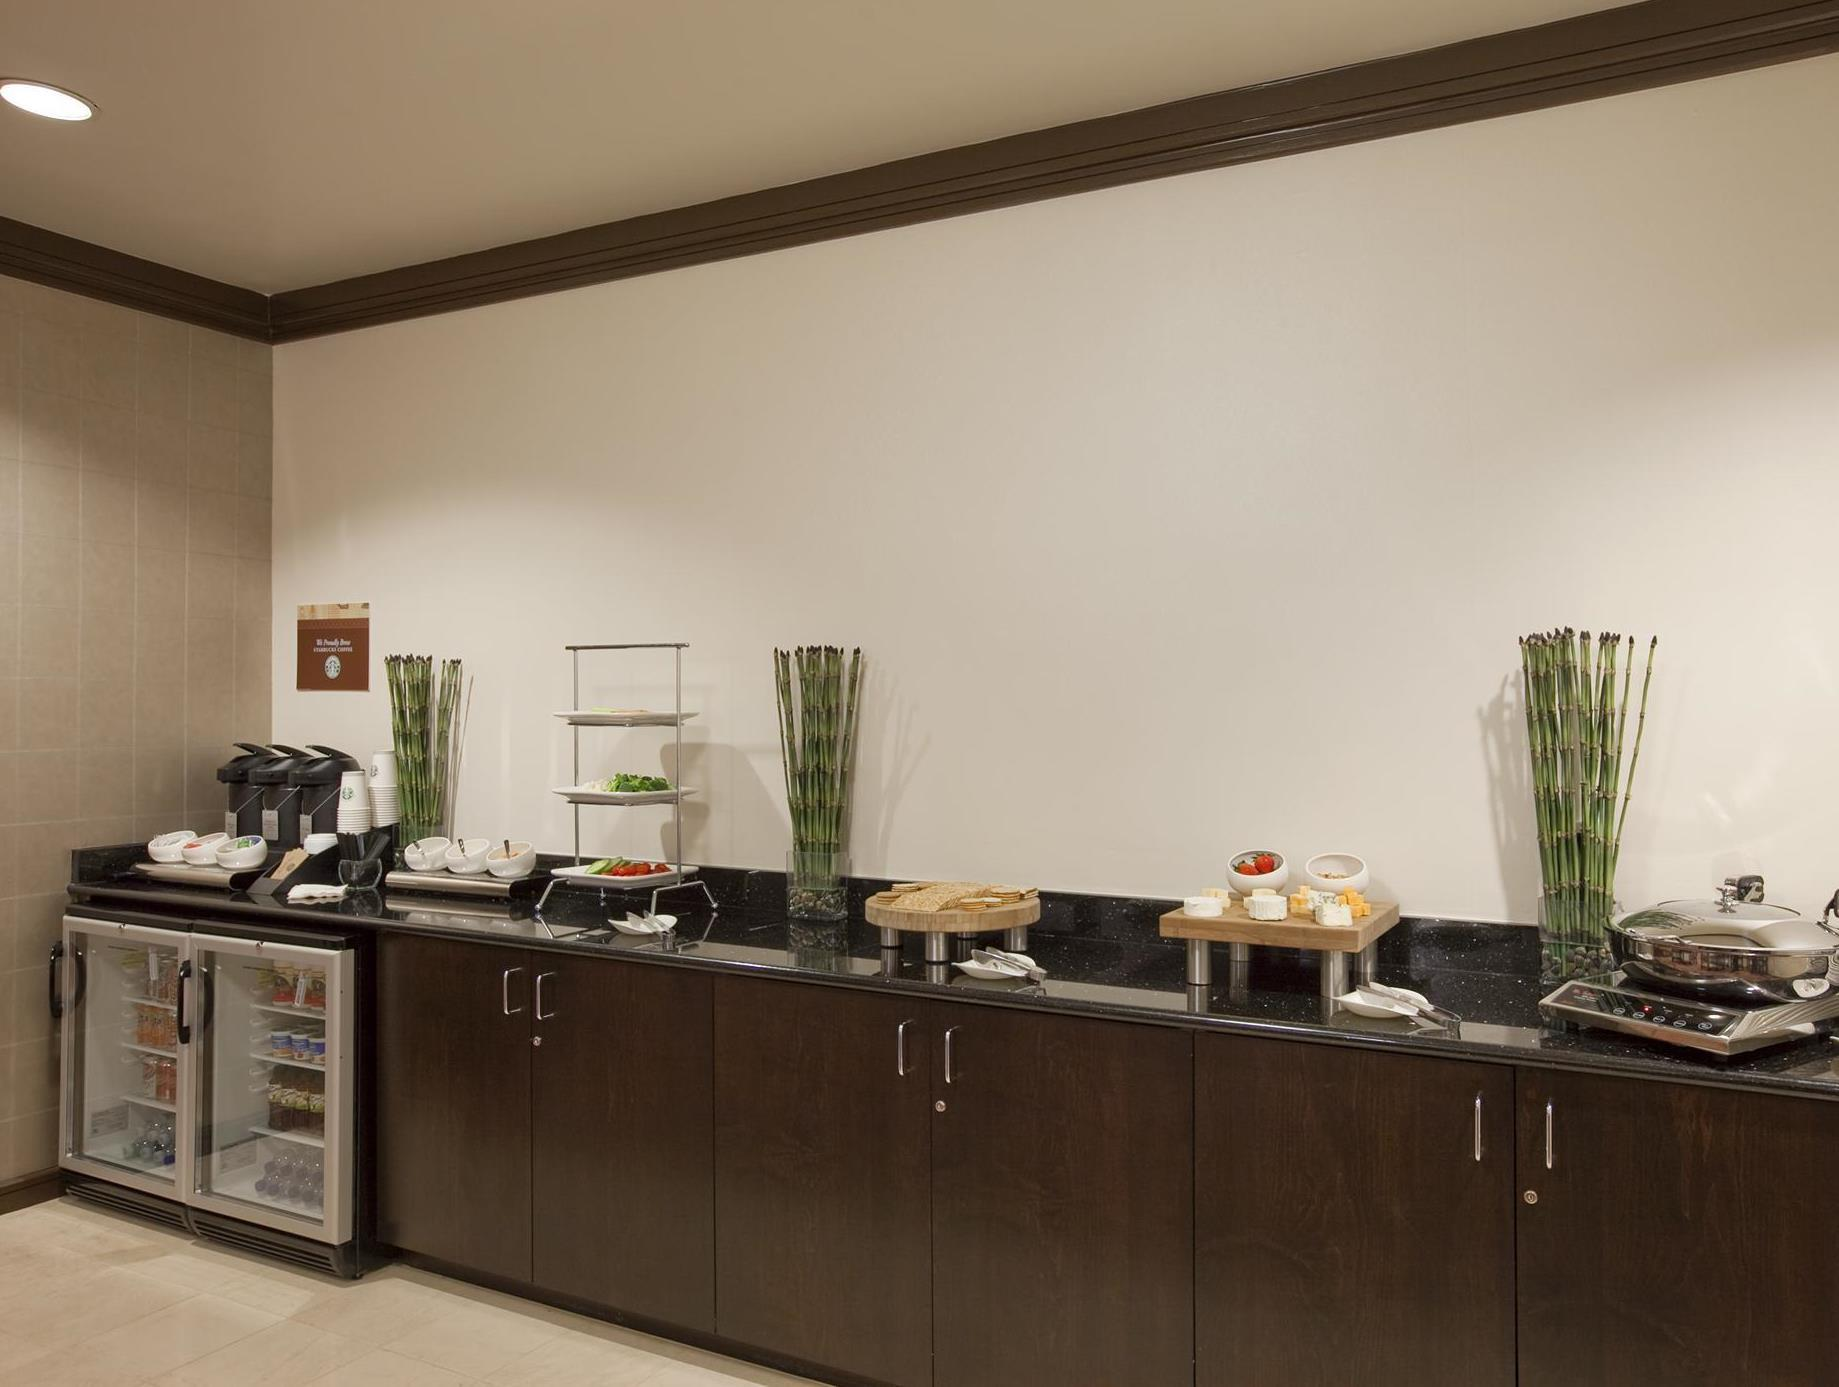 Embassy Suites by Hilton Auburn Hills image